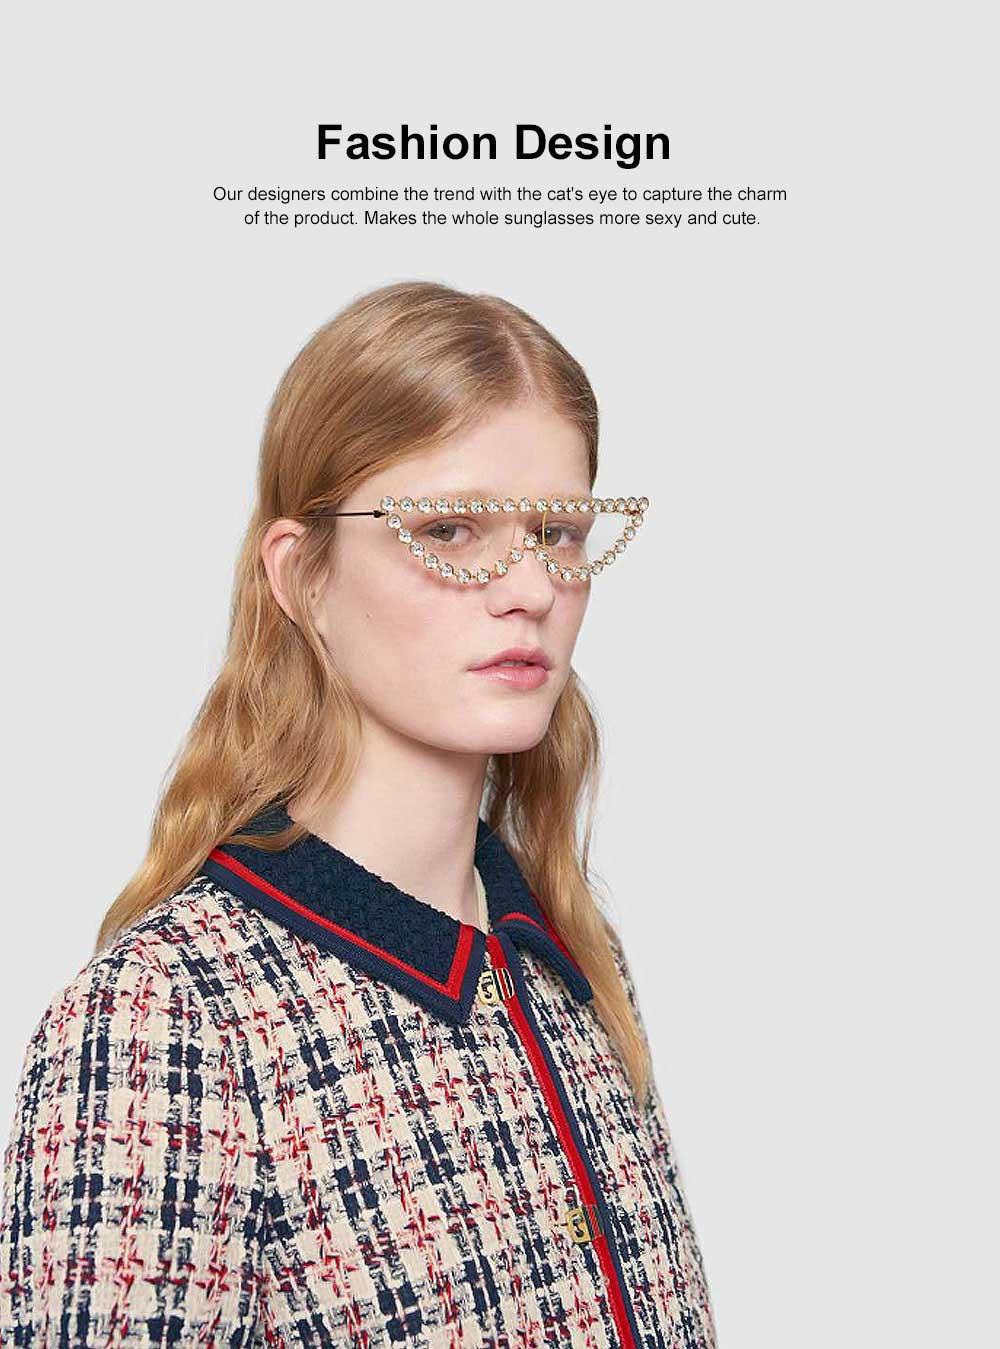 Women's Diamond Sunglasses Vintage Cat Eye Thin Metal Frame Sunglasses Fashion Accessories for Lady Women Girl 1